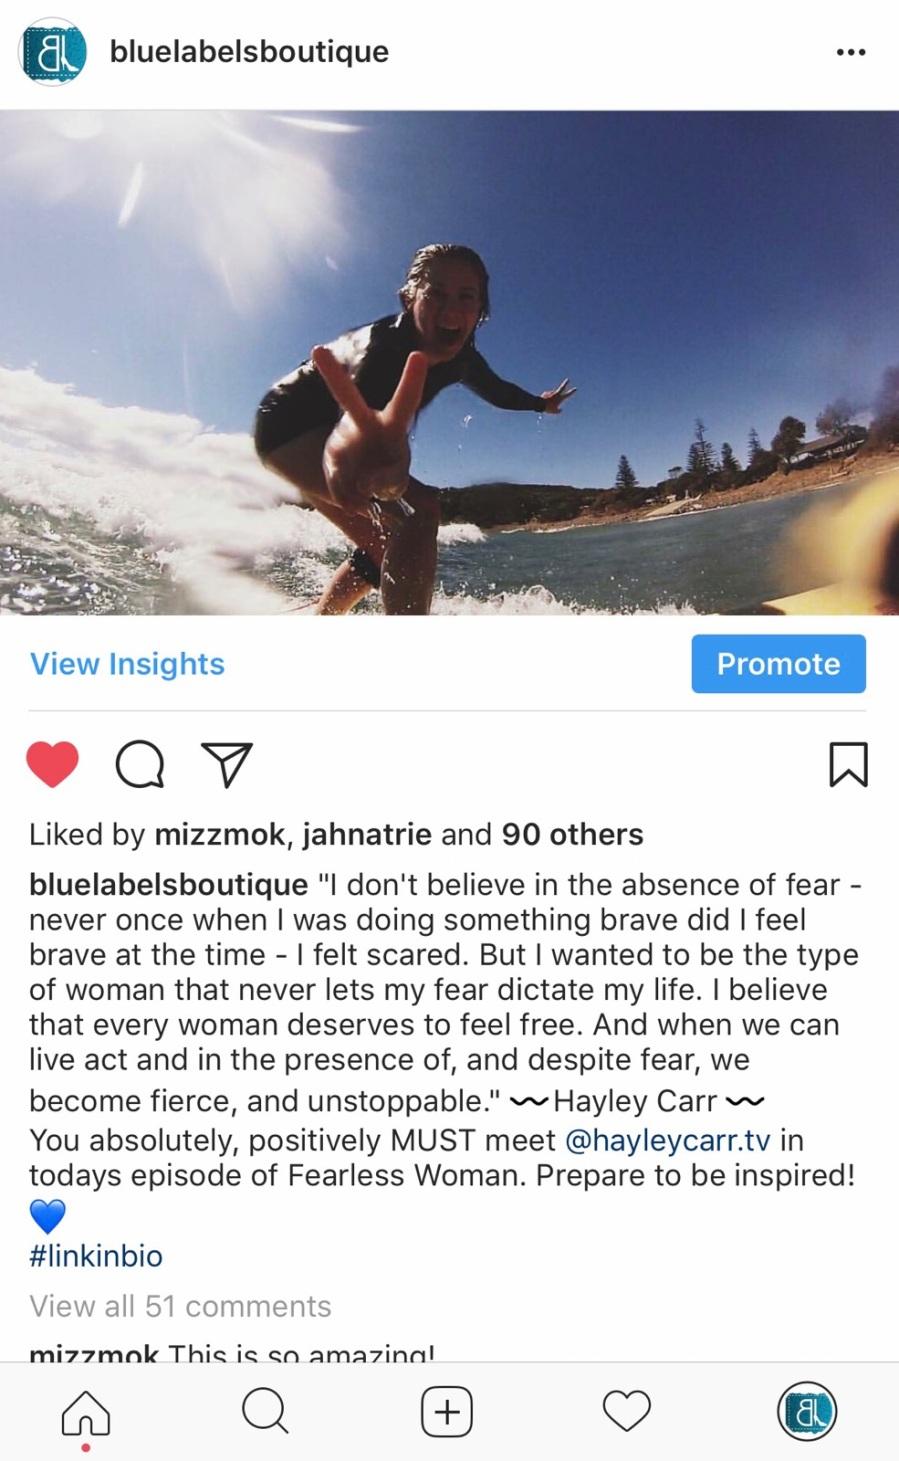 hayley carr surfing